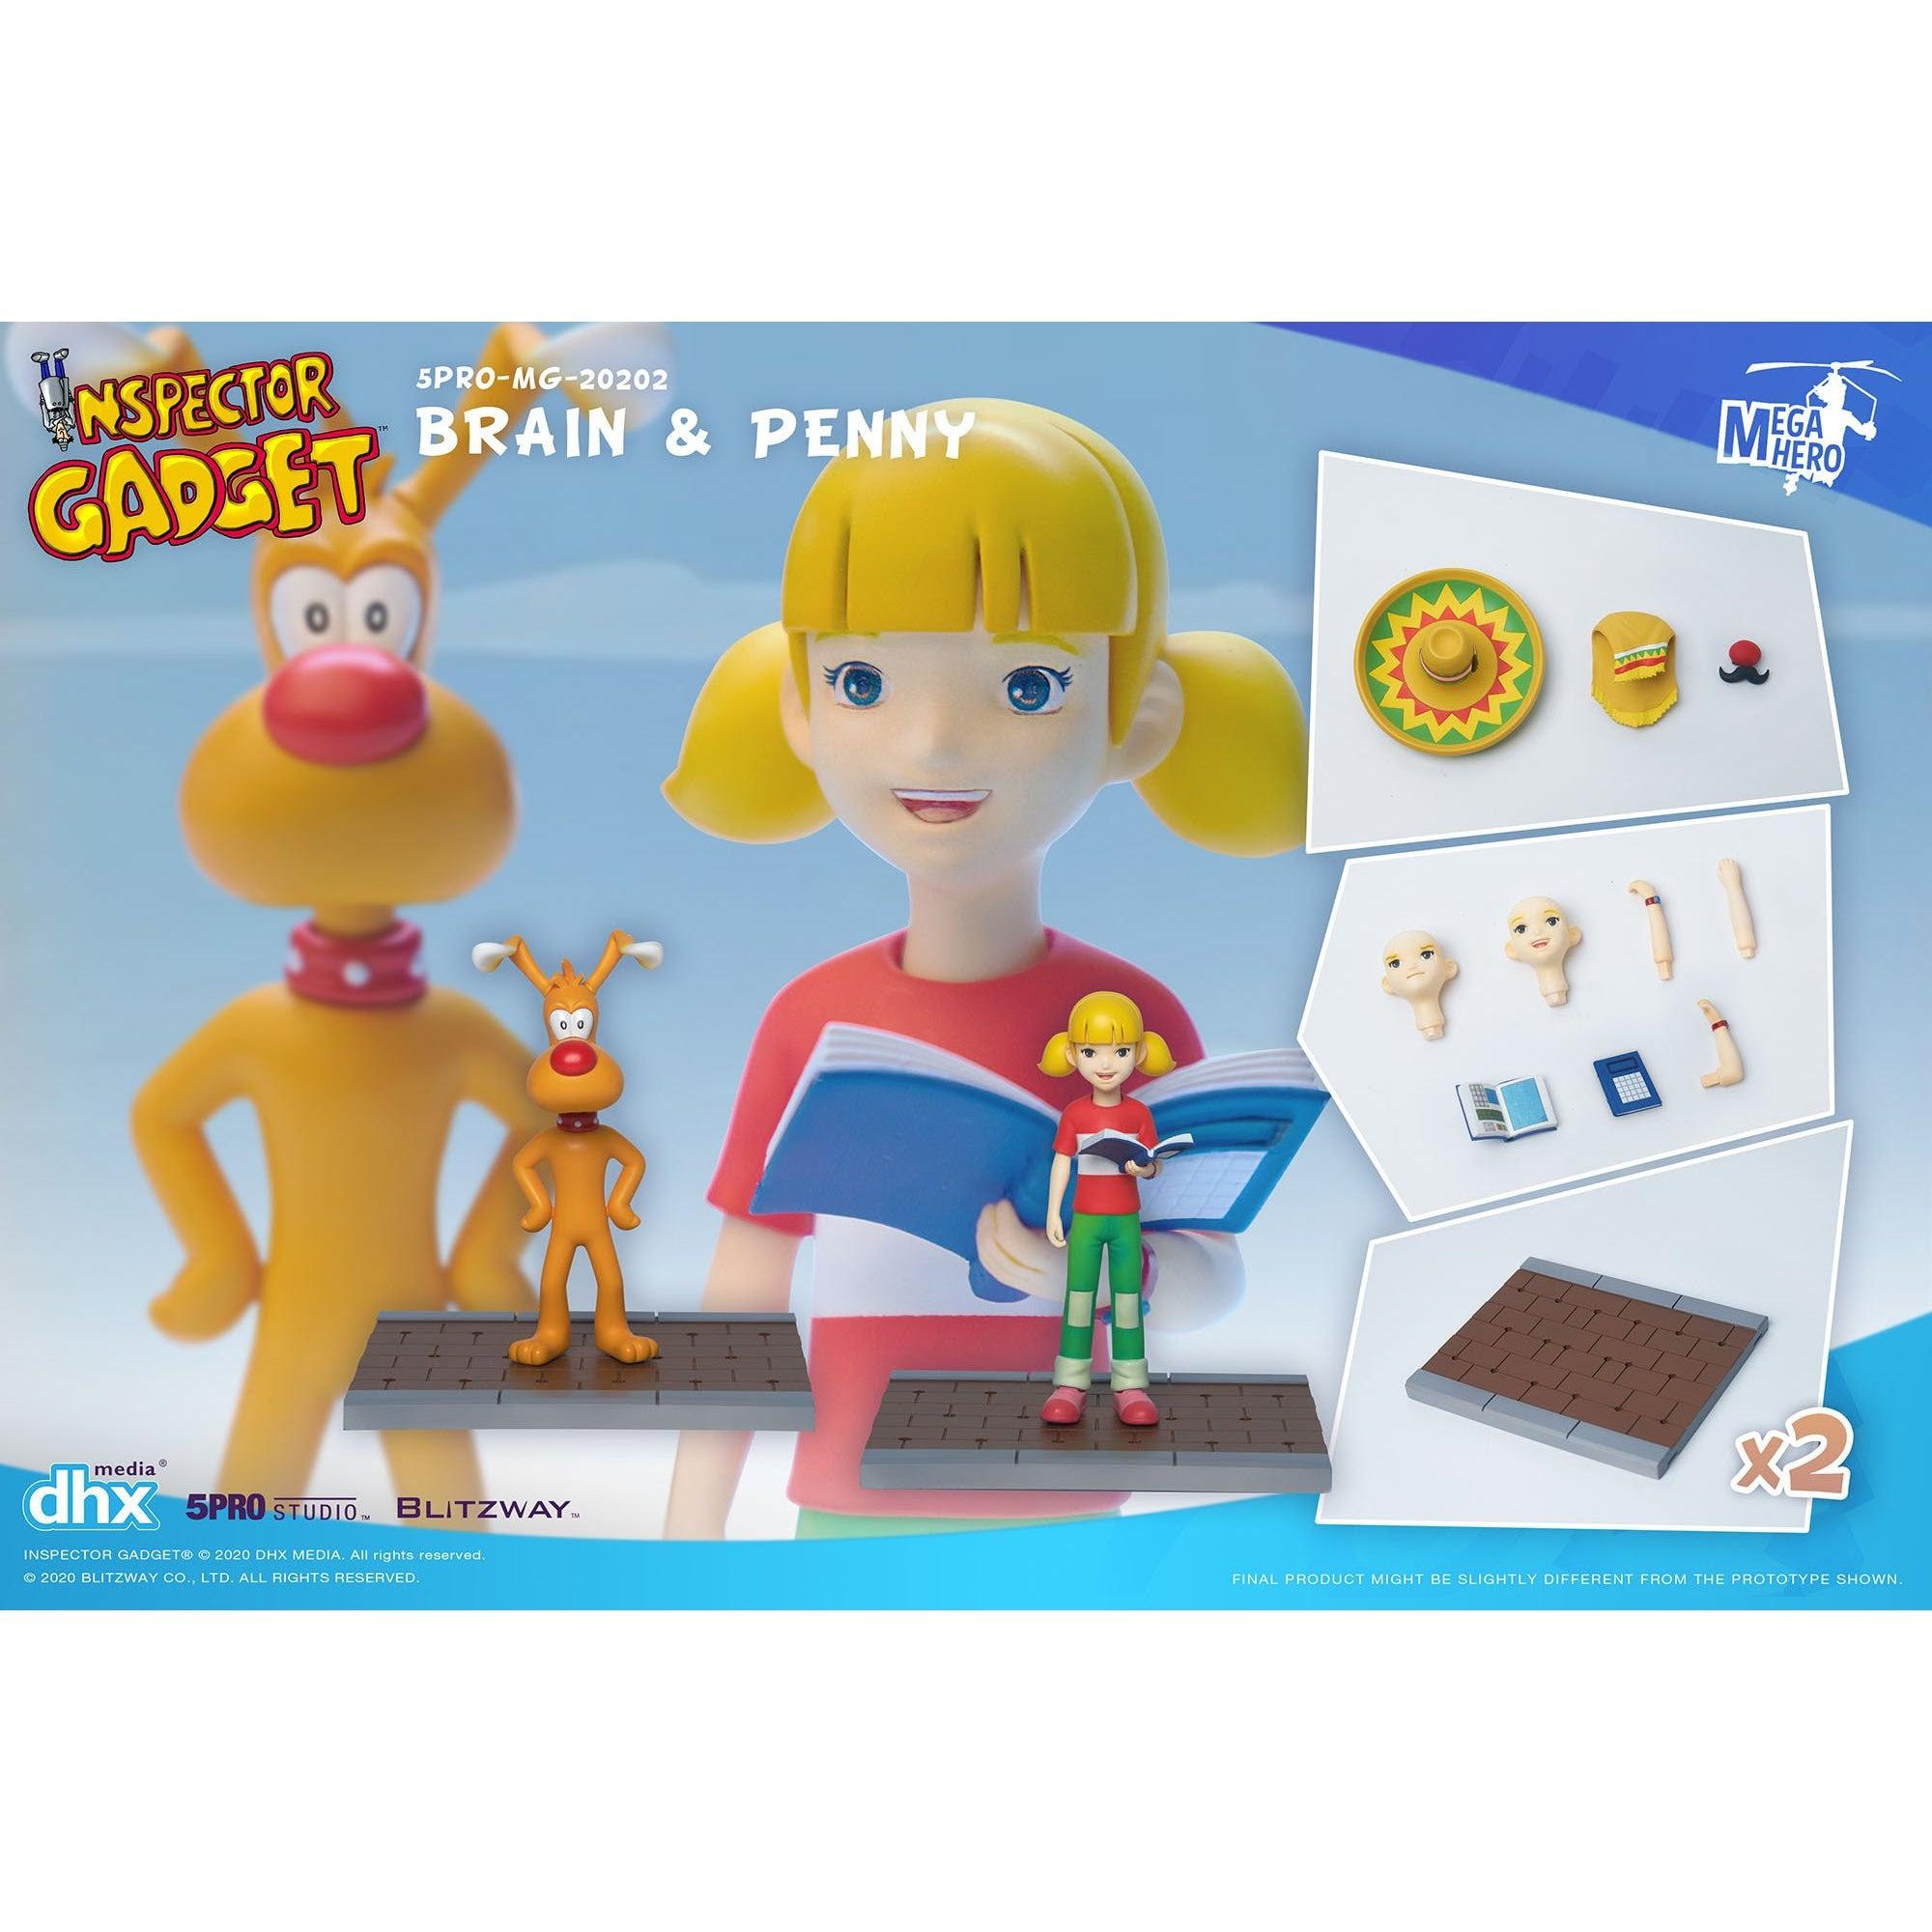 Image of Inspector Gadget MEGAHERO Series - Brain & Penny 1:12 Scale Action Figure Set - Q4 2020